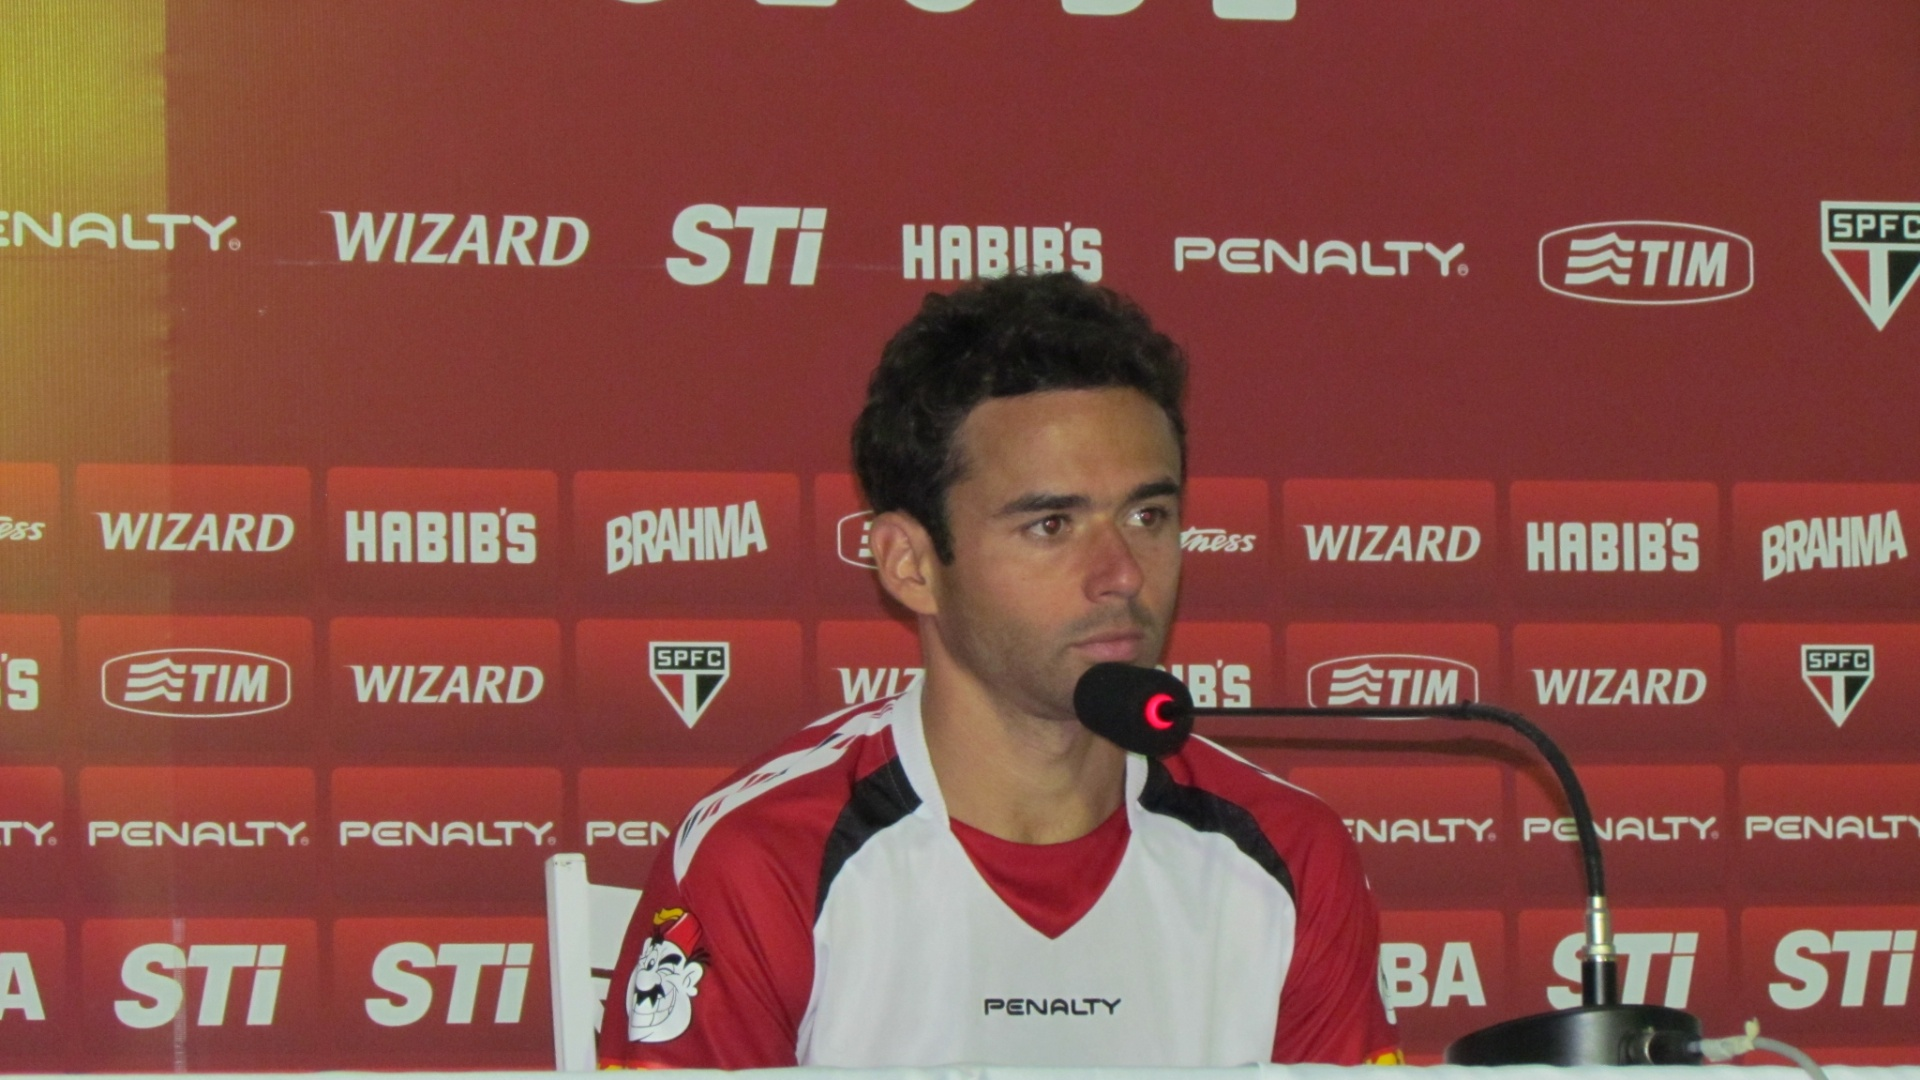 16-05-2013 - Juan dá primeira entrevista após ser reintegrado